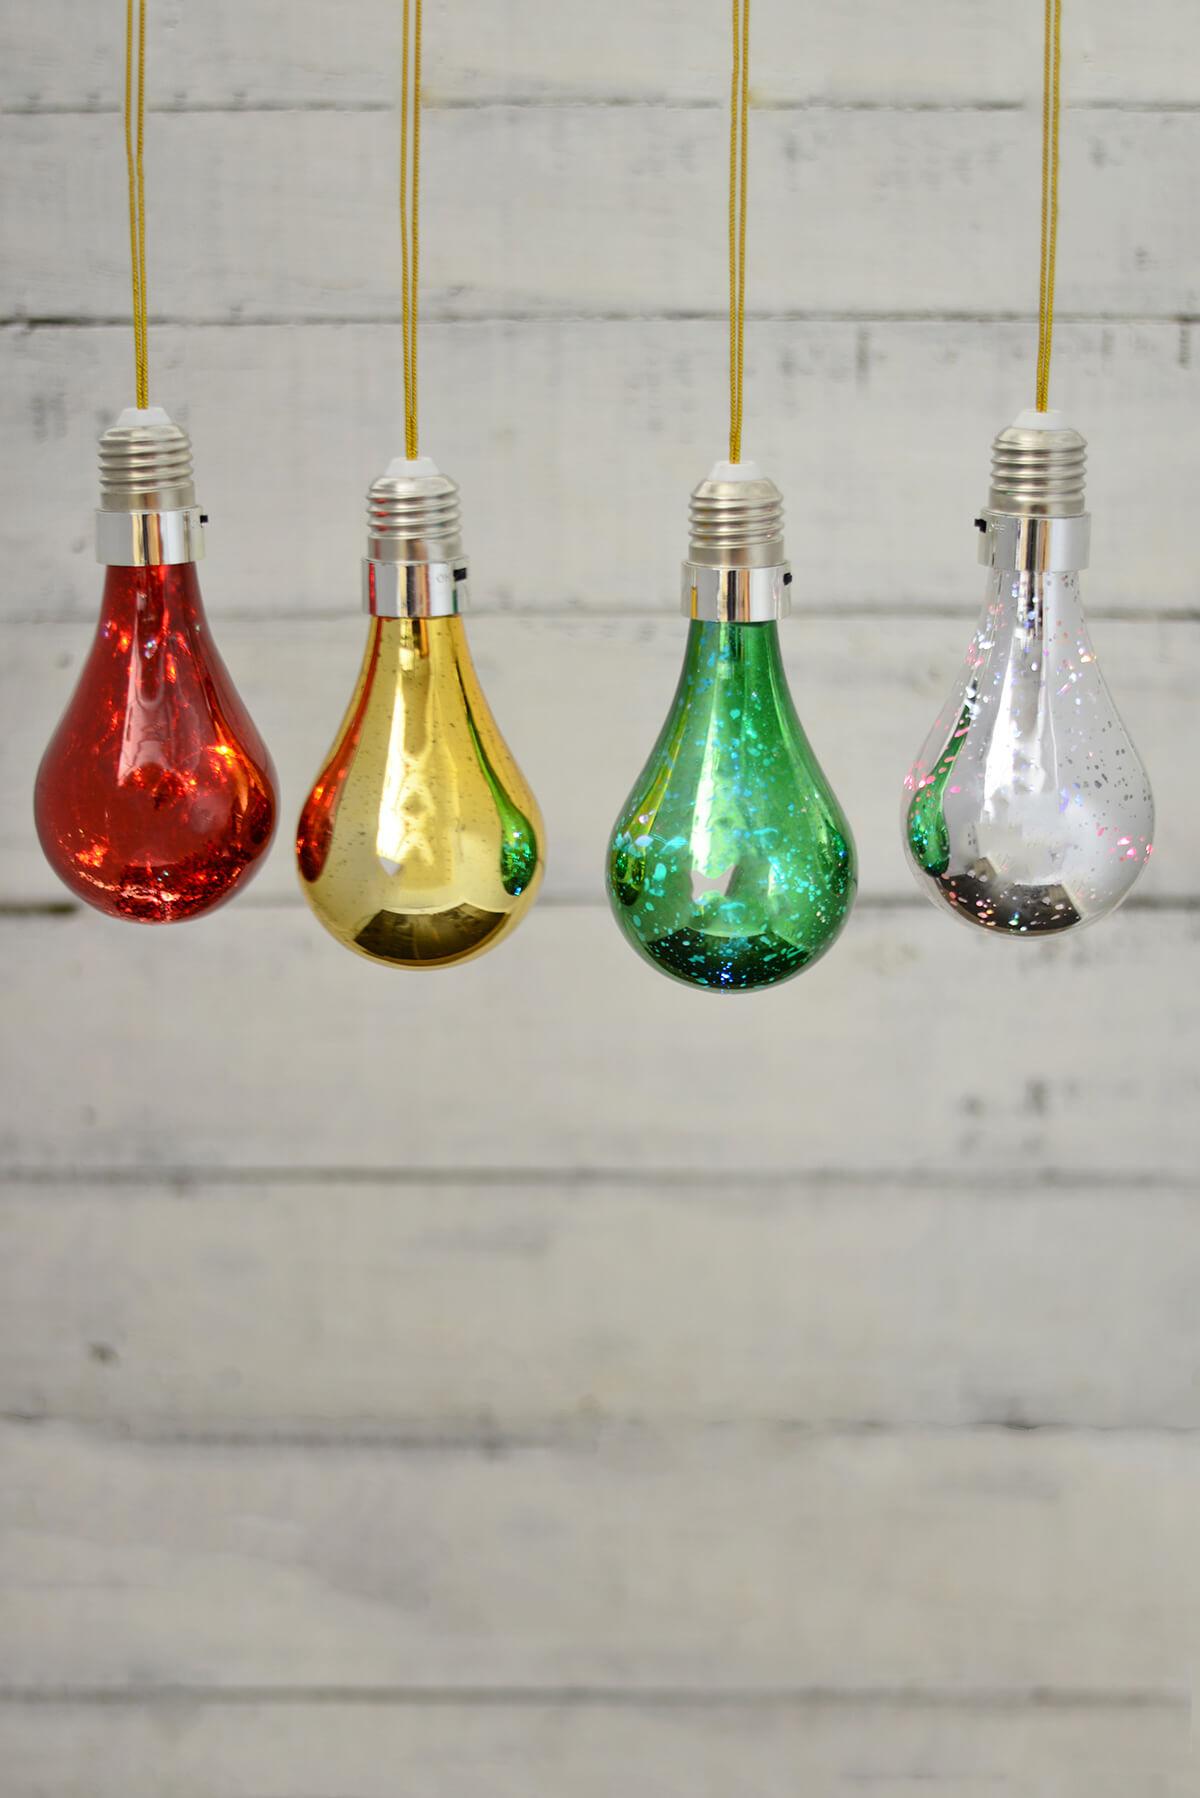 4 Led Mercury Glass Light Bulbs 5 5 Quot Christmas Decorations